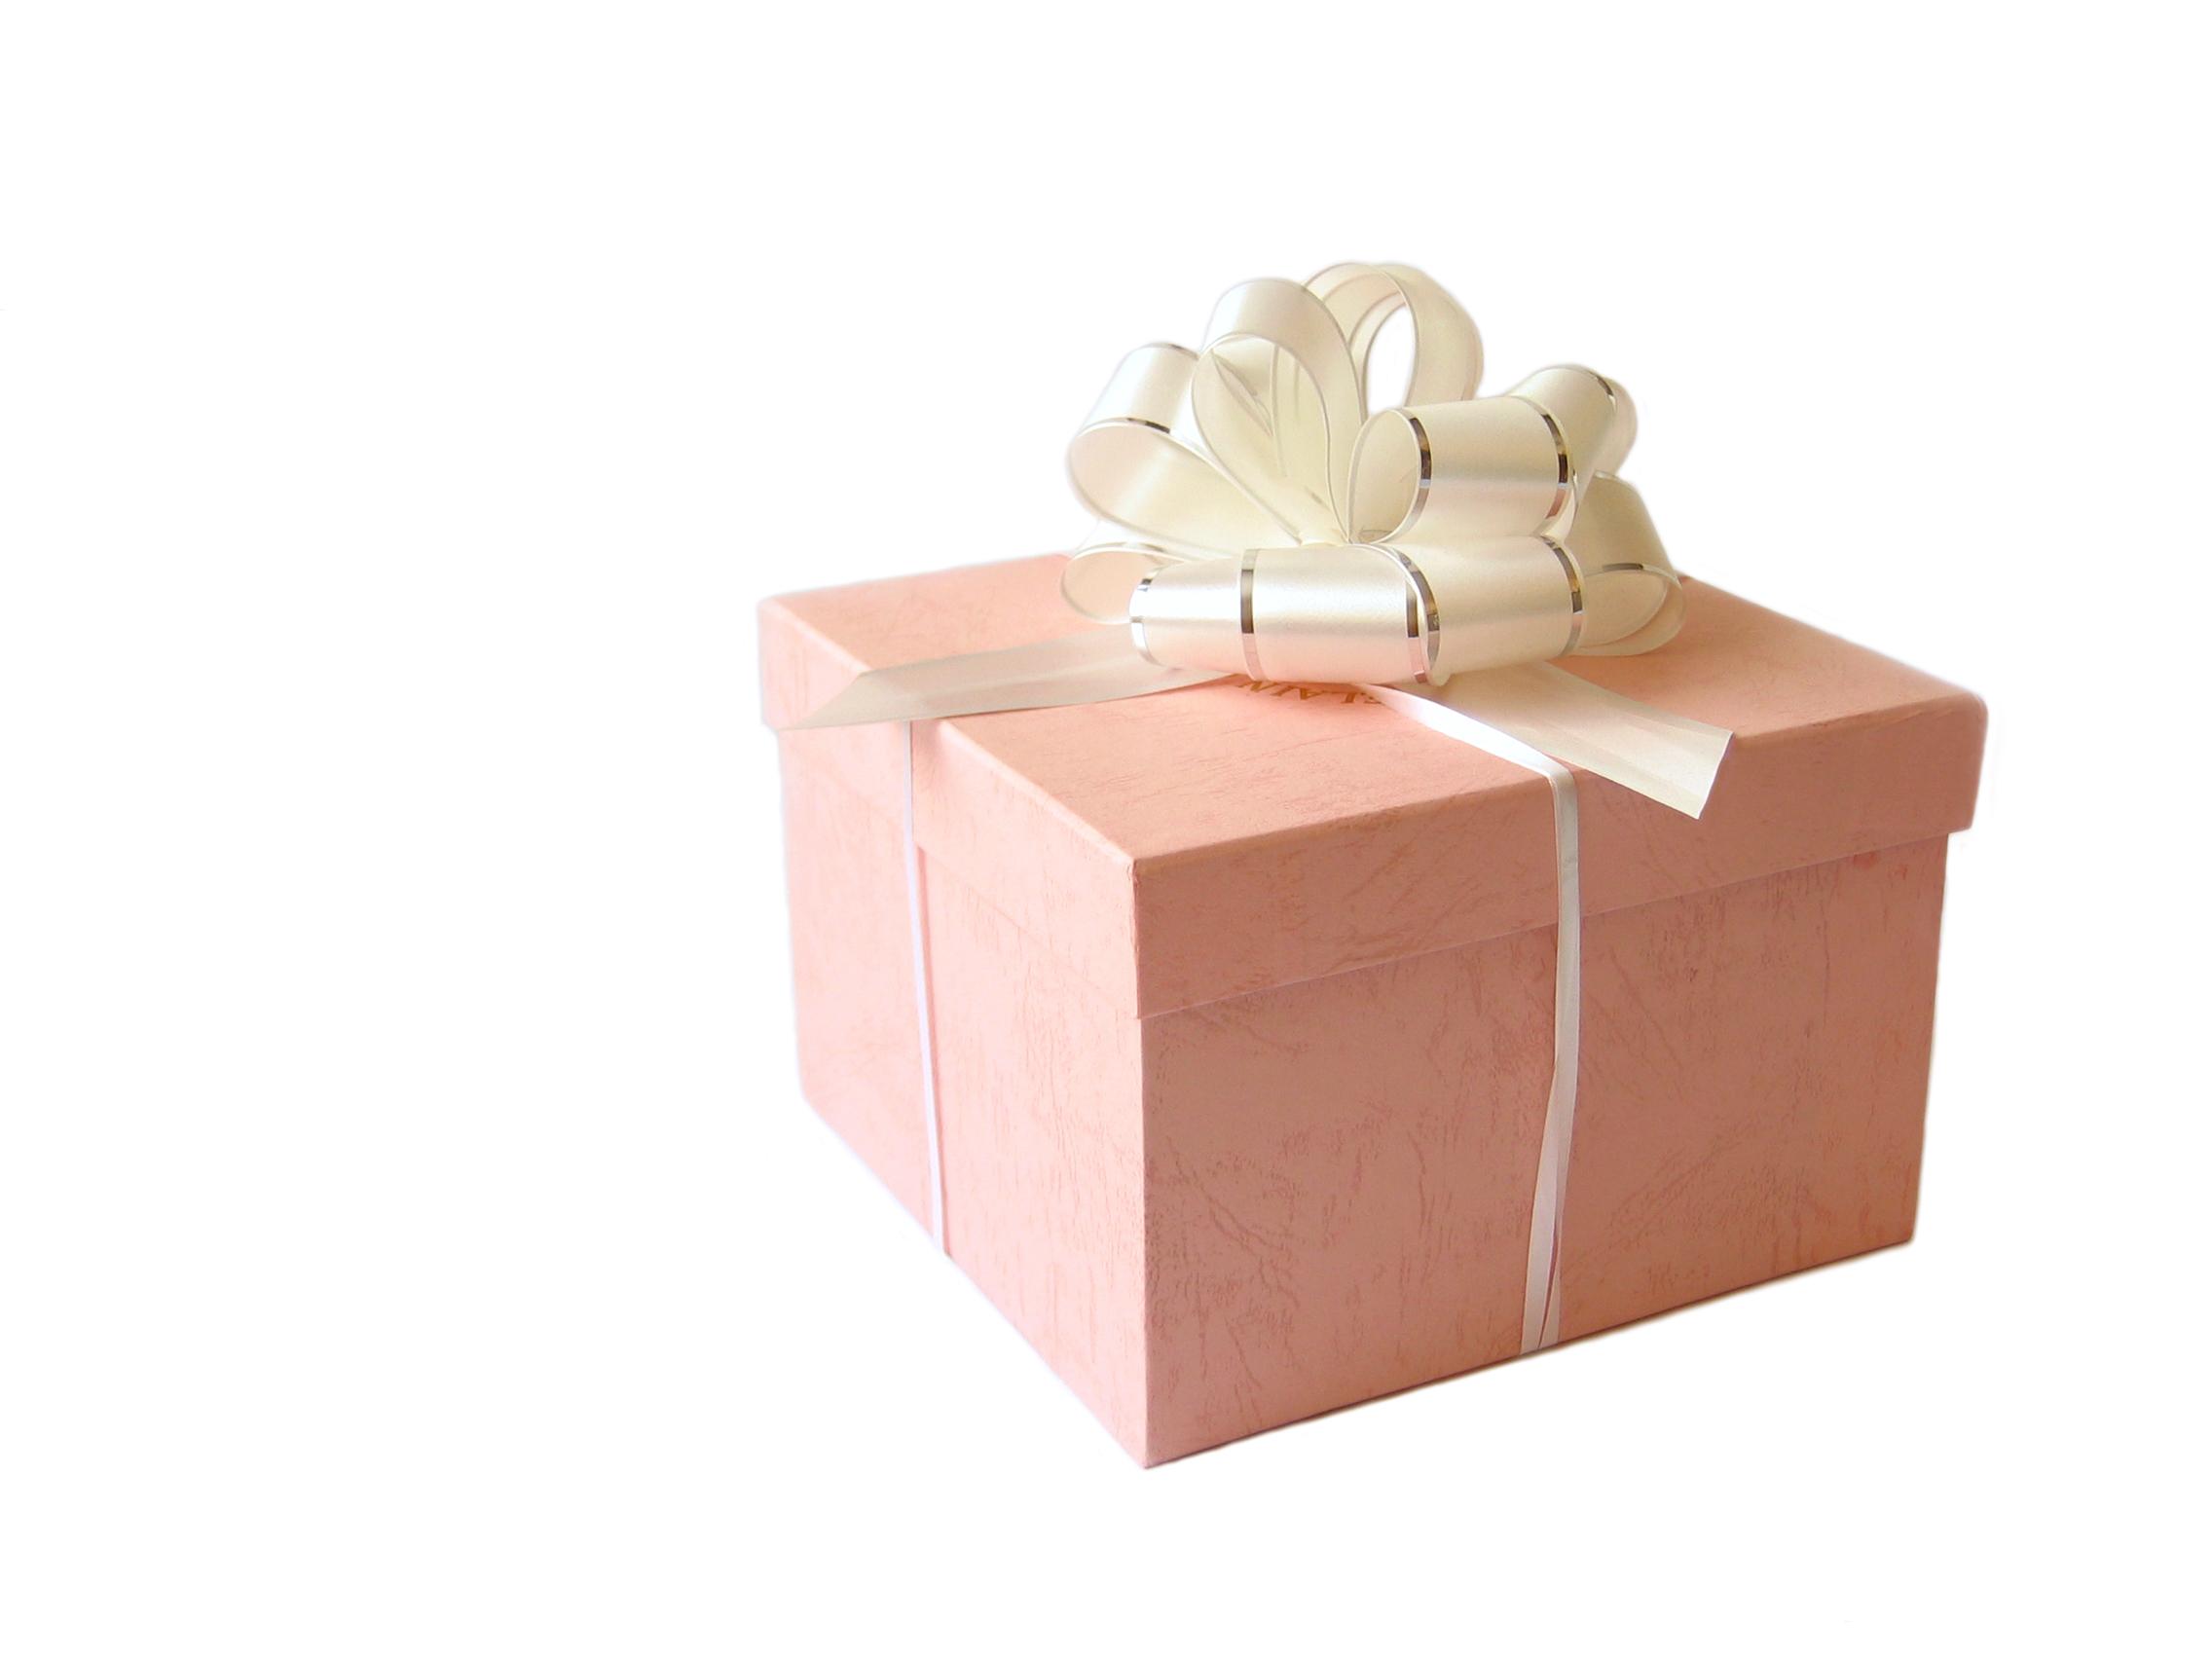 dreamstime-box-bow